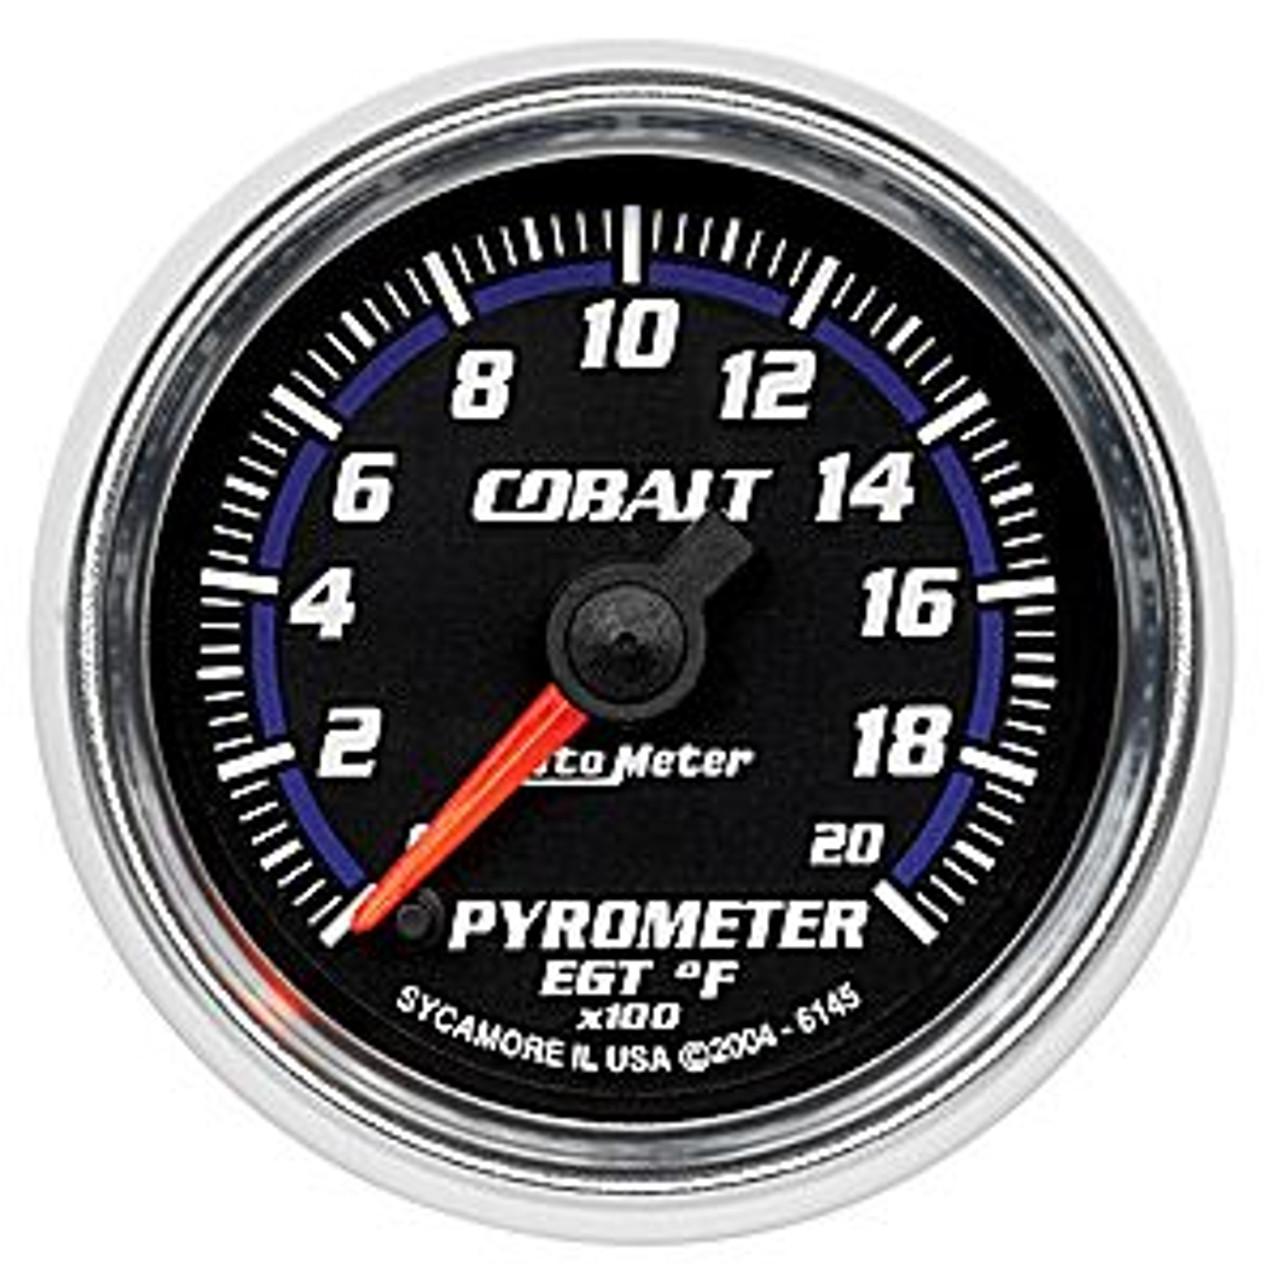 Autometer Cobalt Pyrometer, 0-2000`F, 2In.